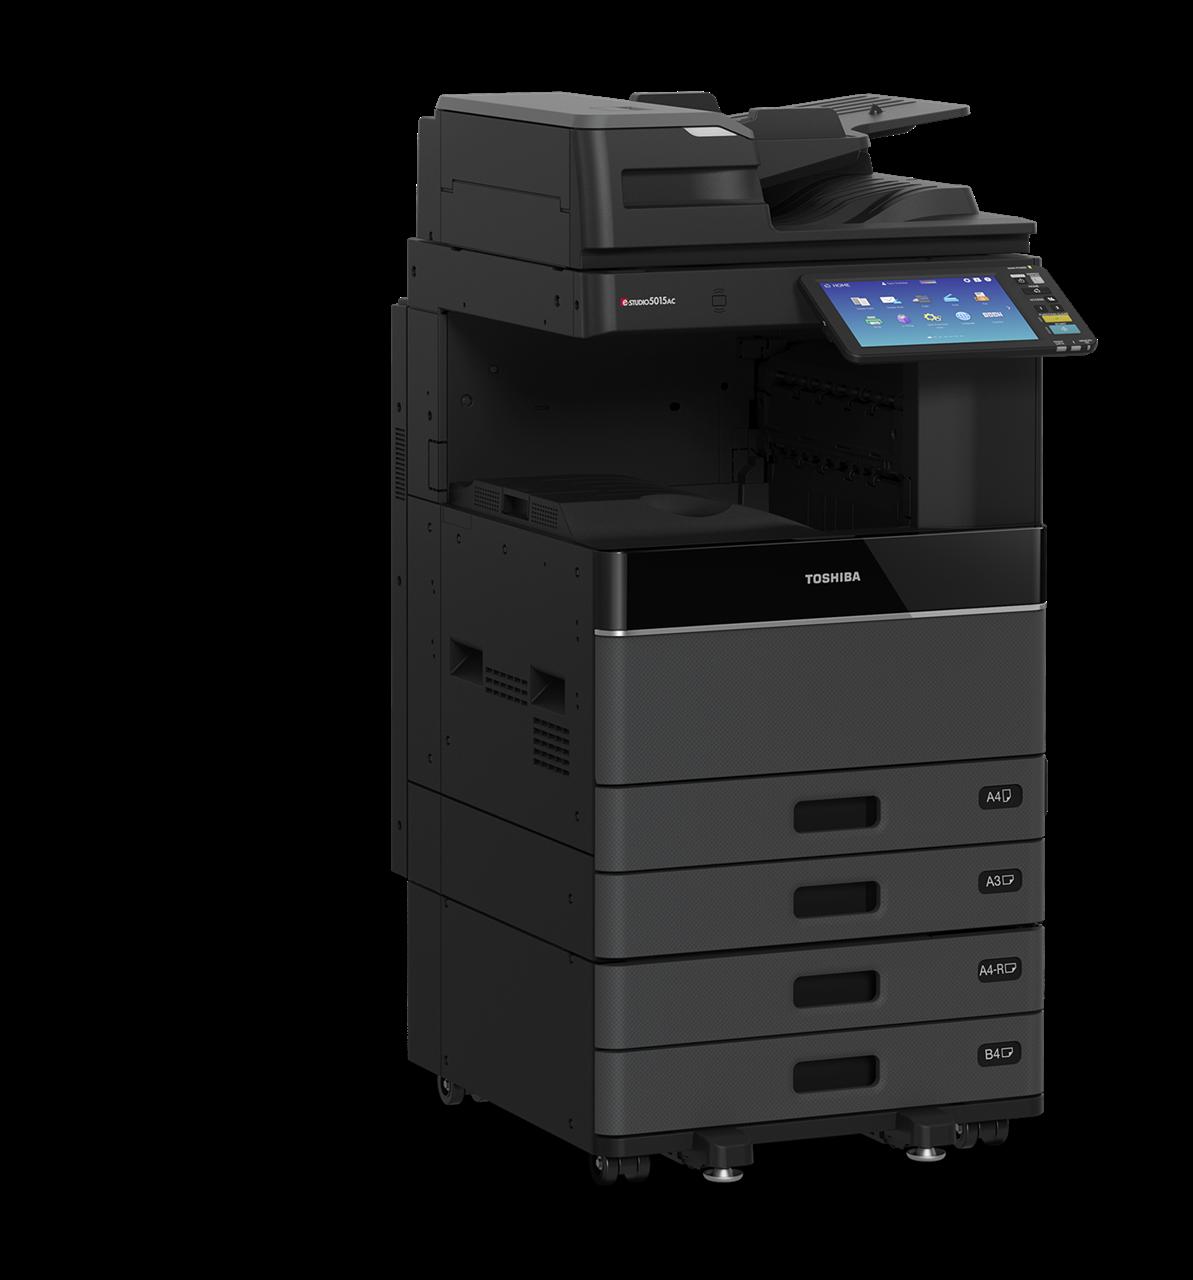 Toshiba E-Studio 2515-5015AC Photocopier Multifunctional Printer